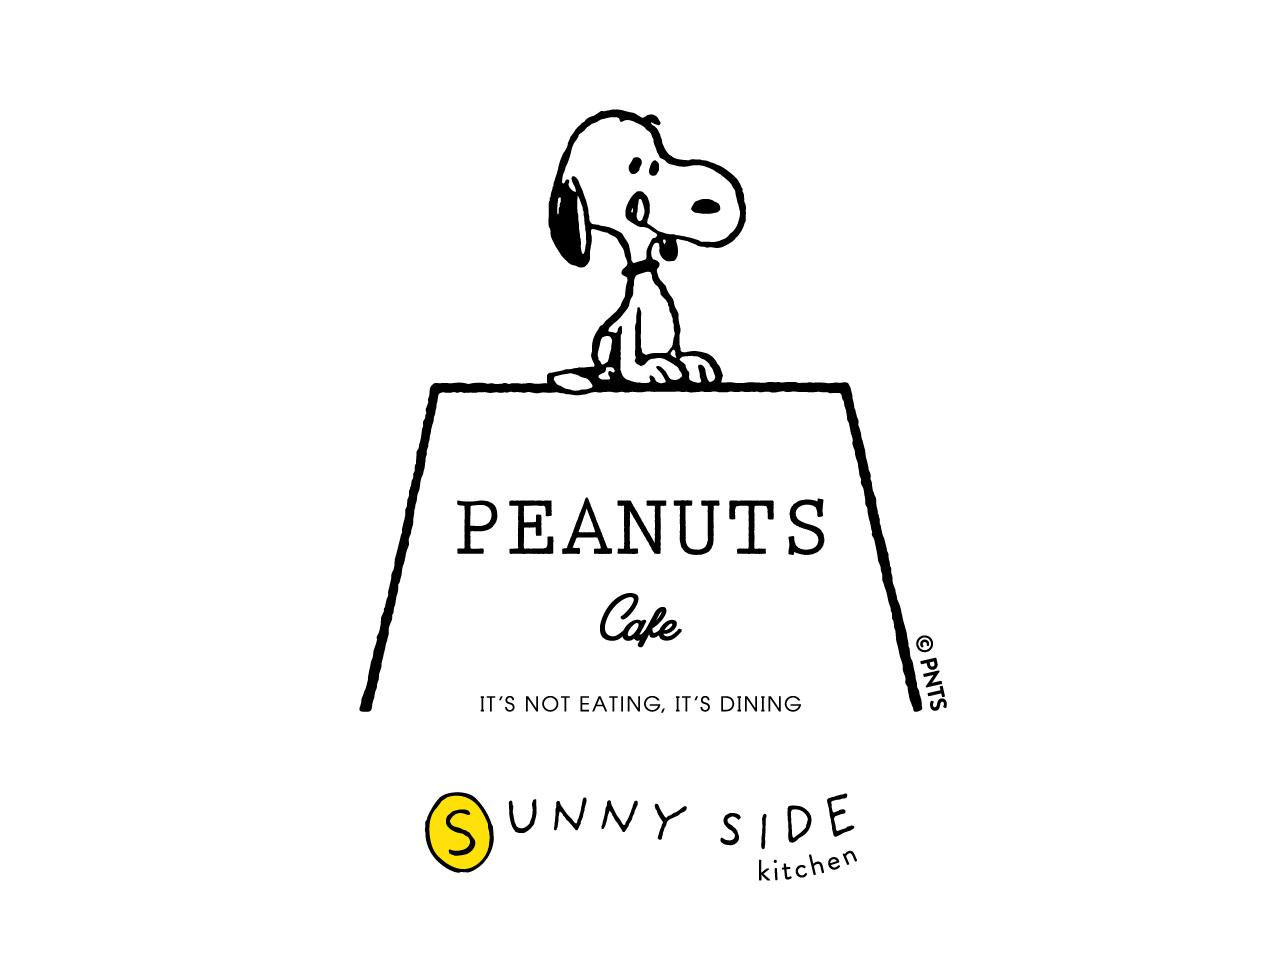 peanuts-cafe-sunny-side-kitchen